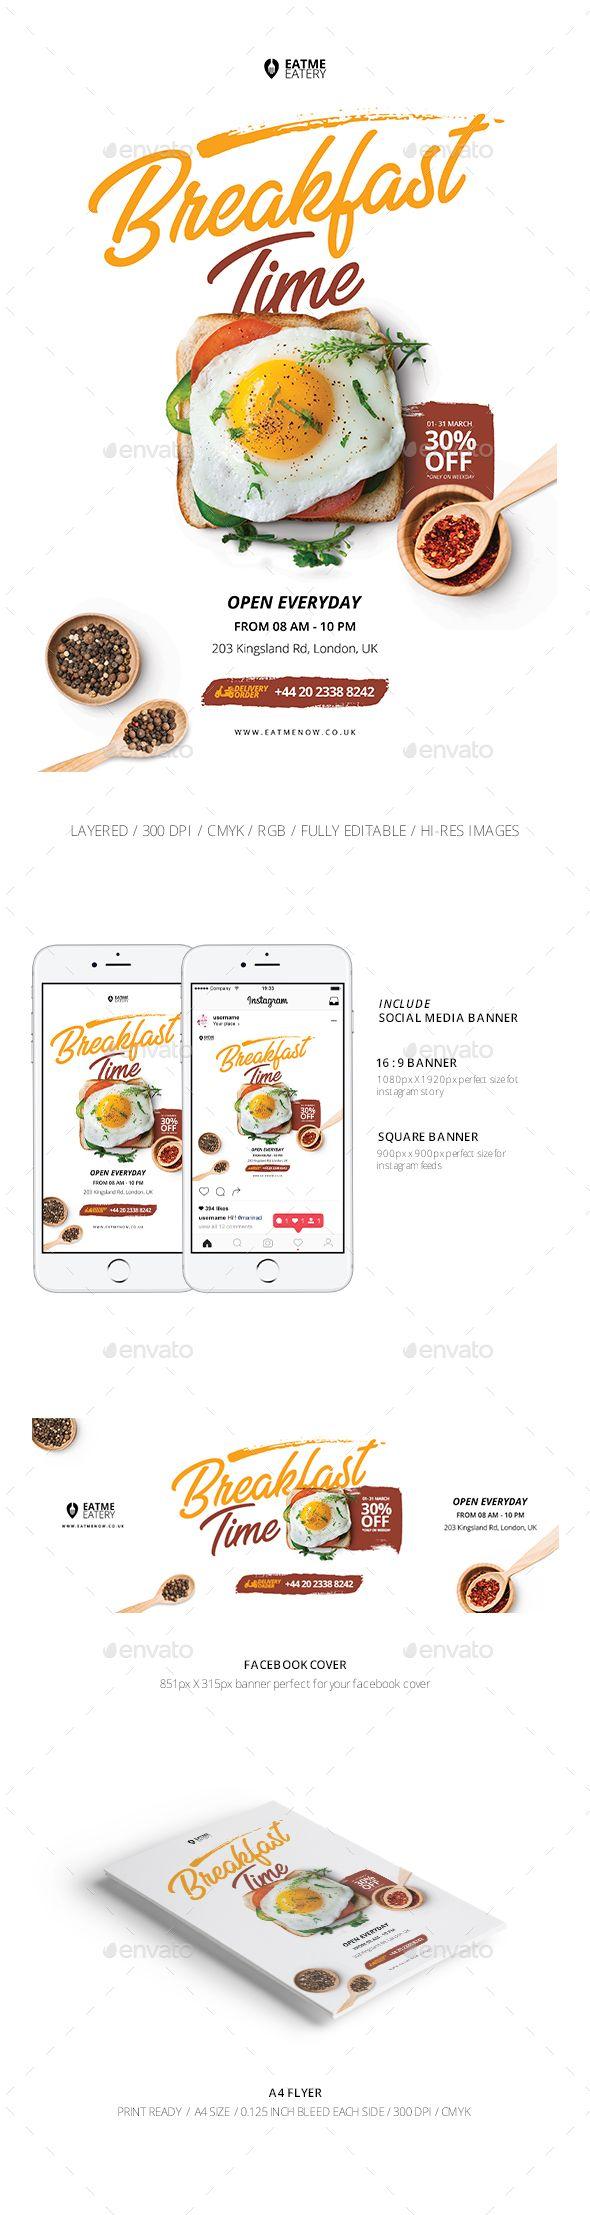 Food Flyer & Social Media Banner - Restaurant Flyers